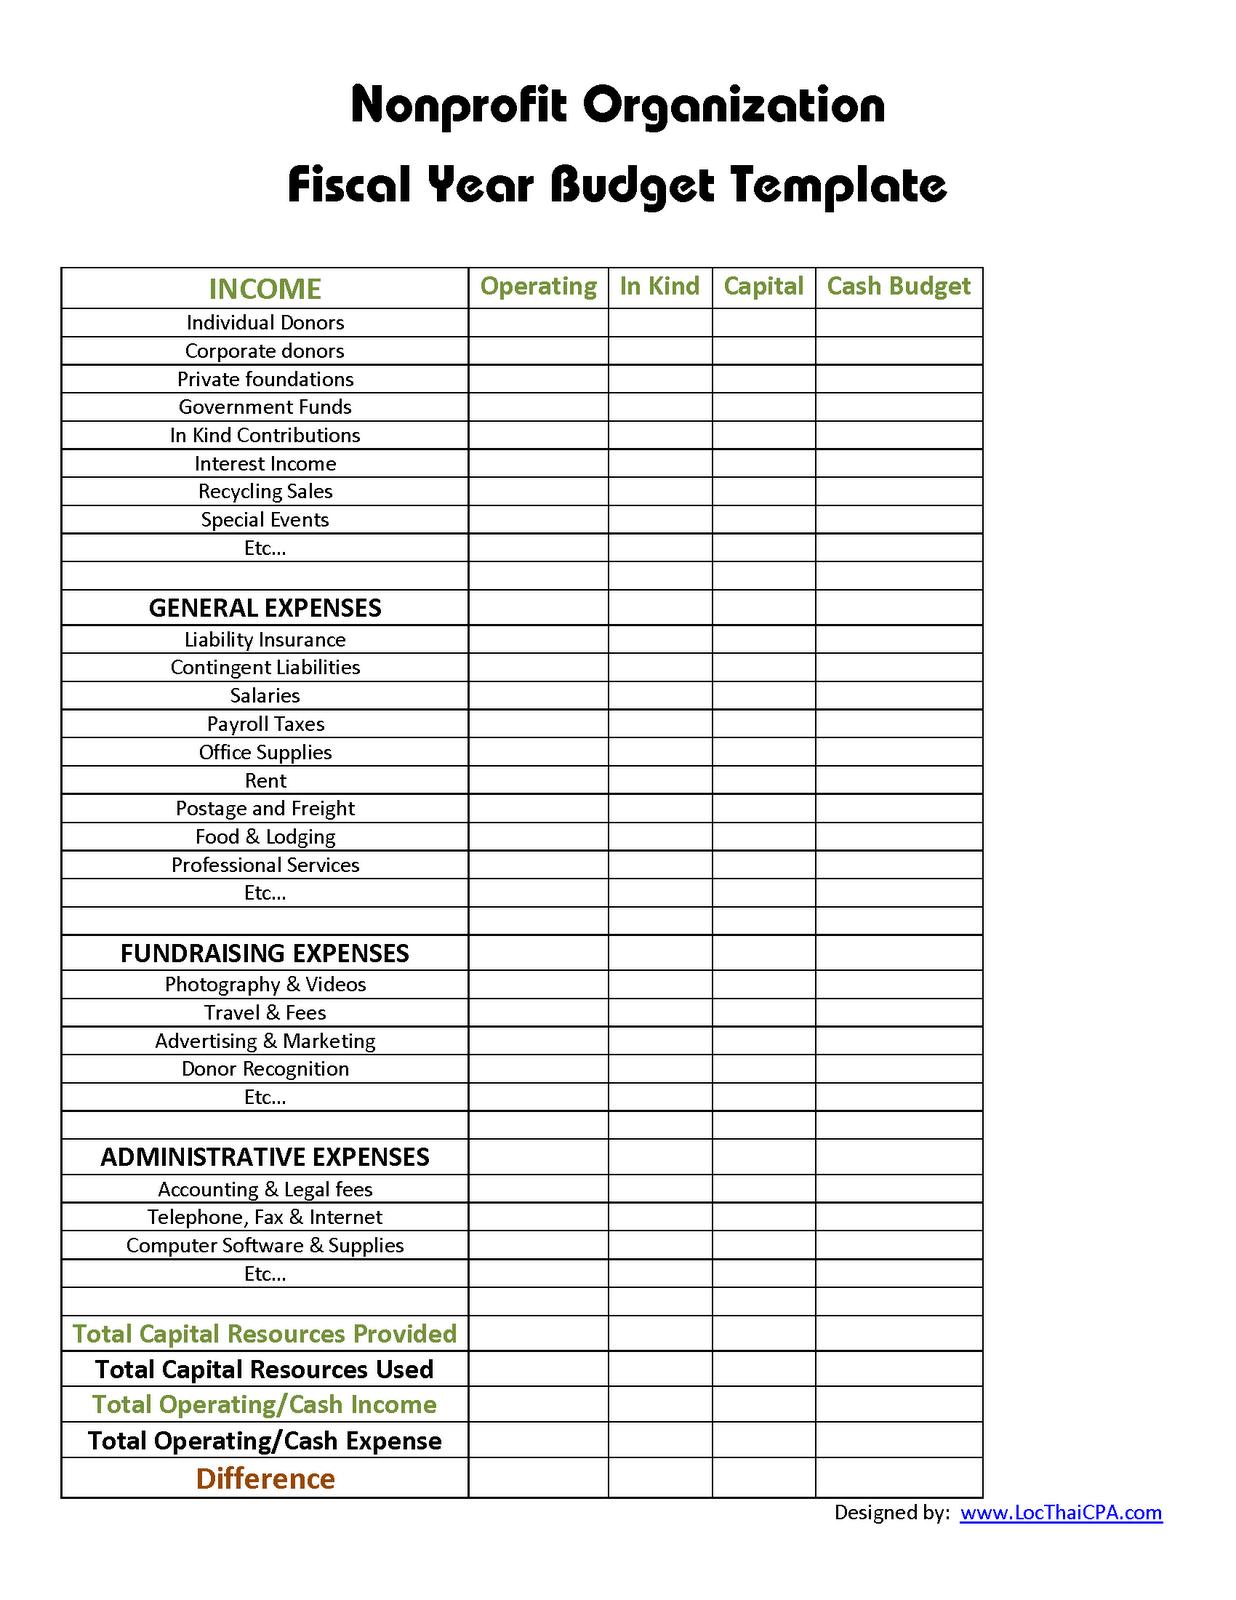 Non Profit Organization Nonprofit Budget Template